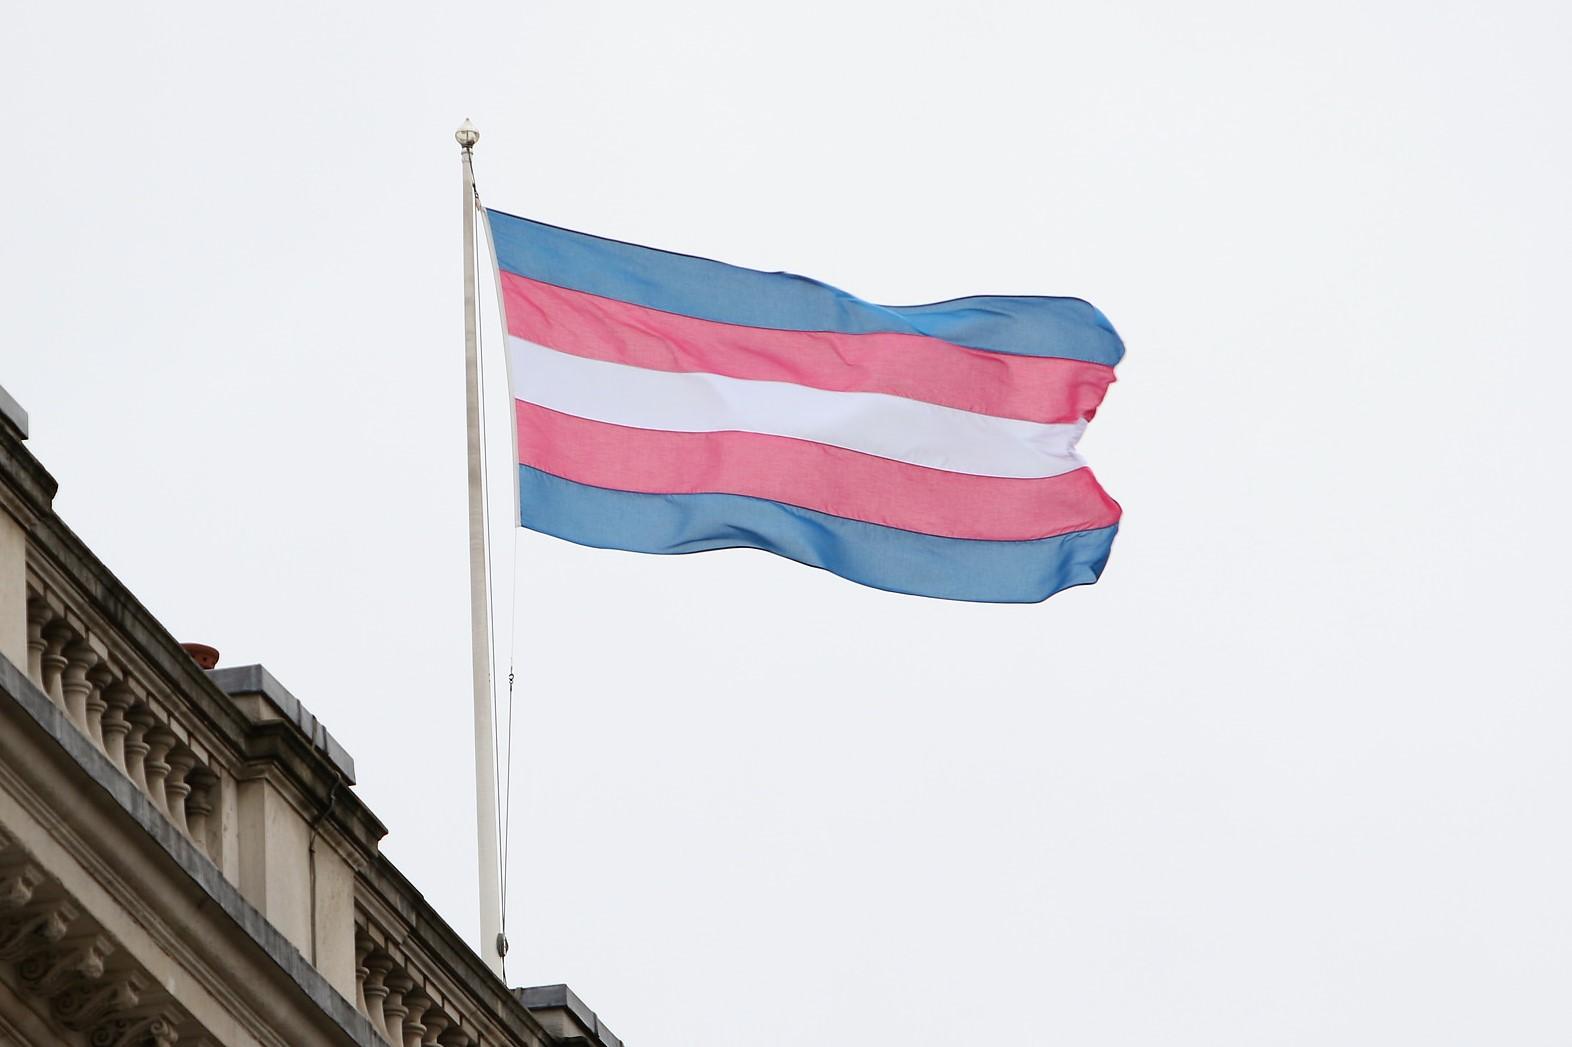 https://i1.wp.com/www.metroweekly.com/wp-content/uploads/2017/12/trans-pride-flag.jpg